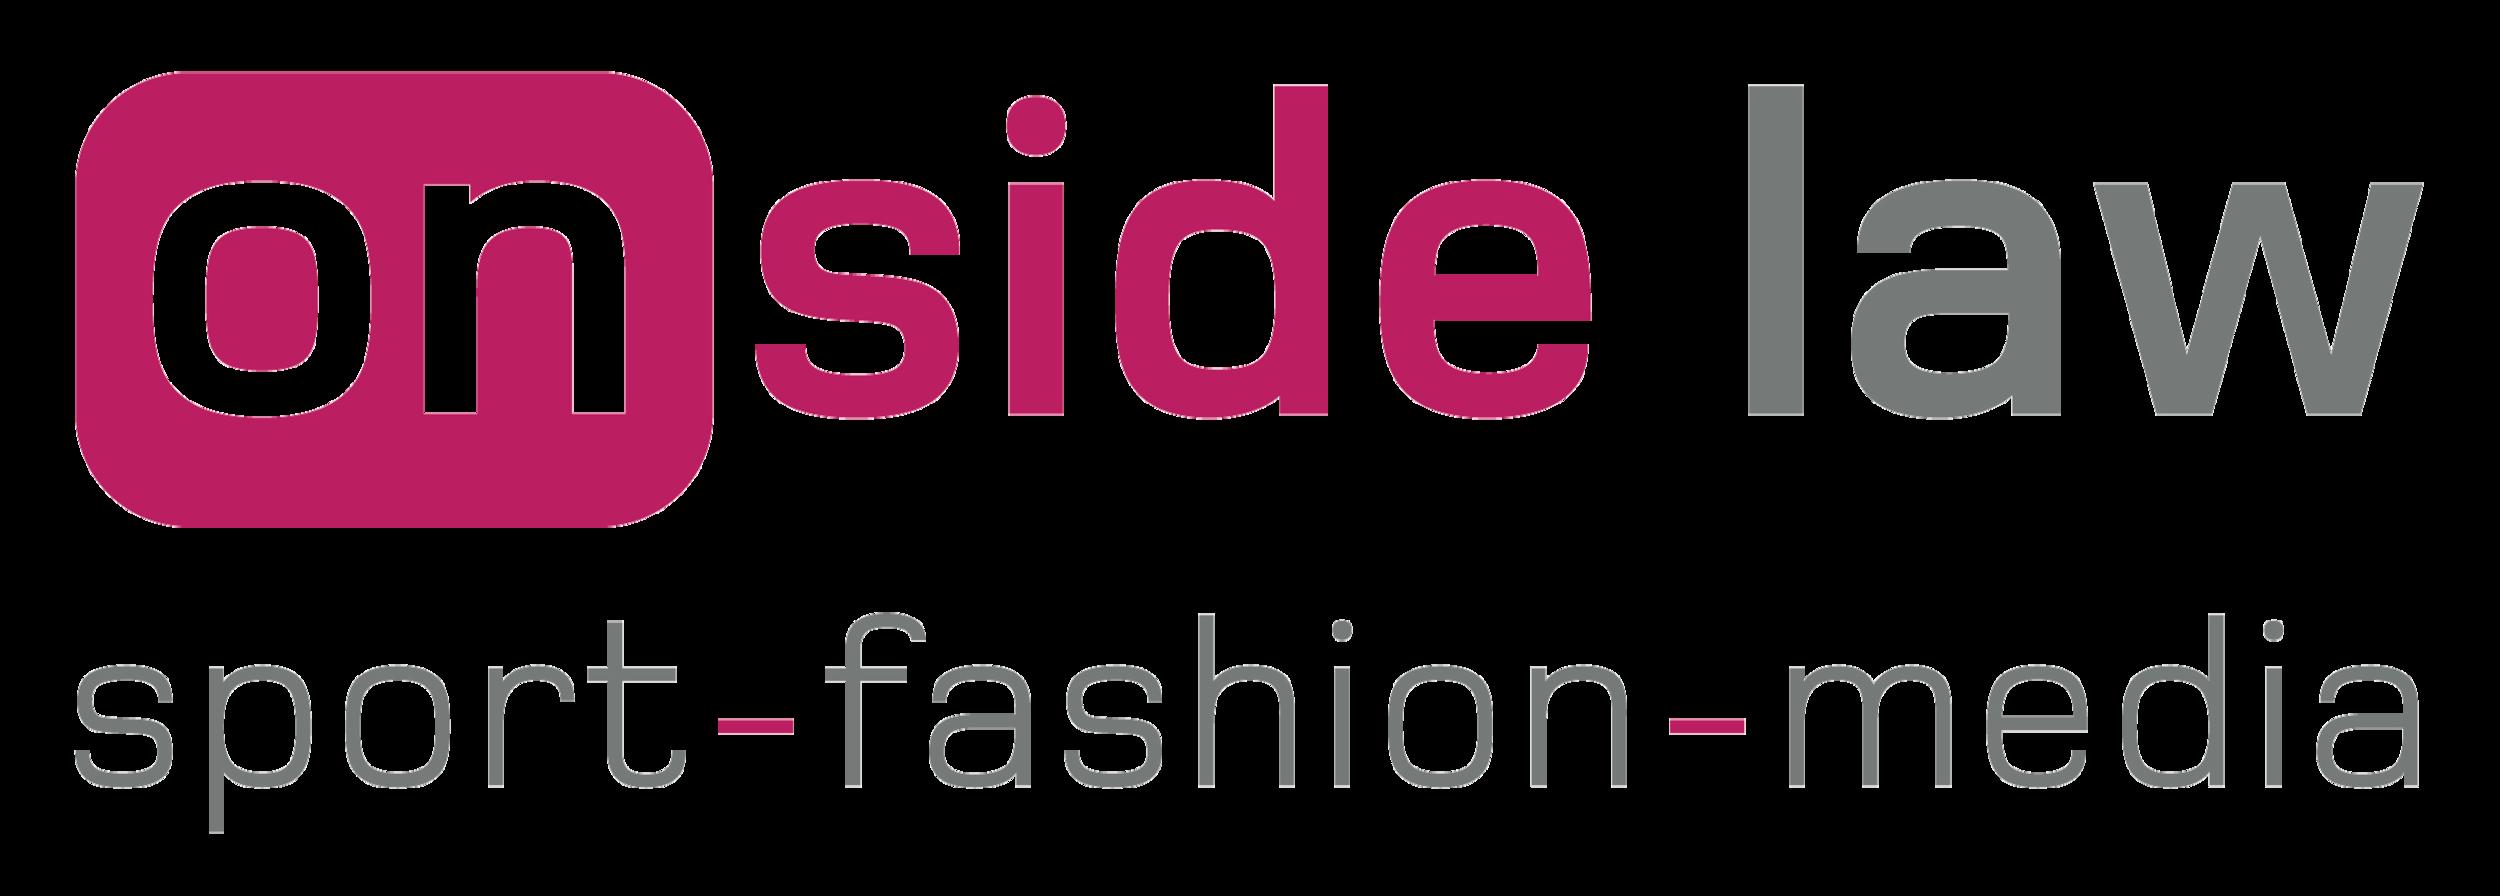 Onside Law sport-fashion-media no background.png